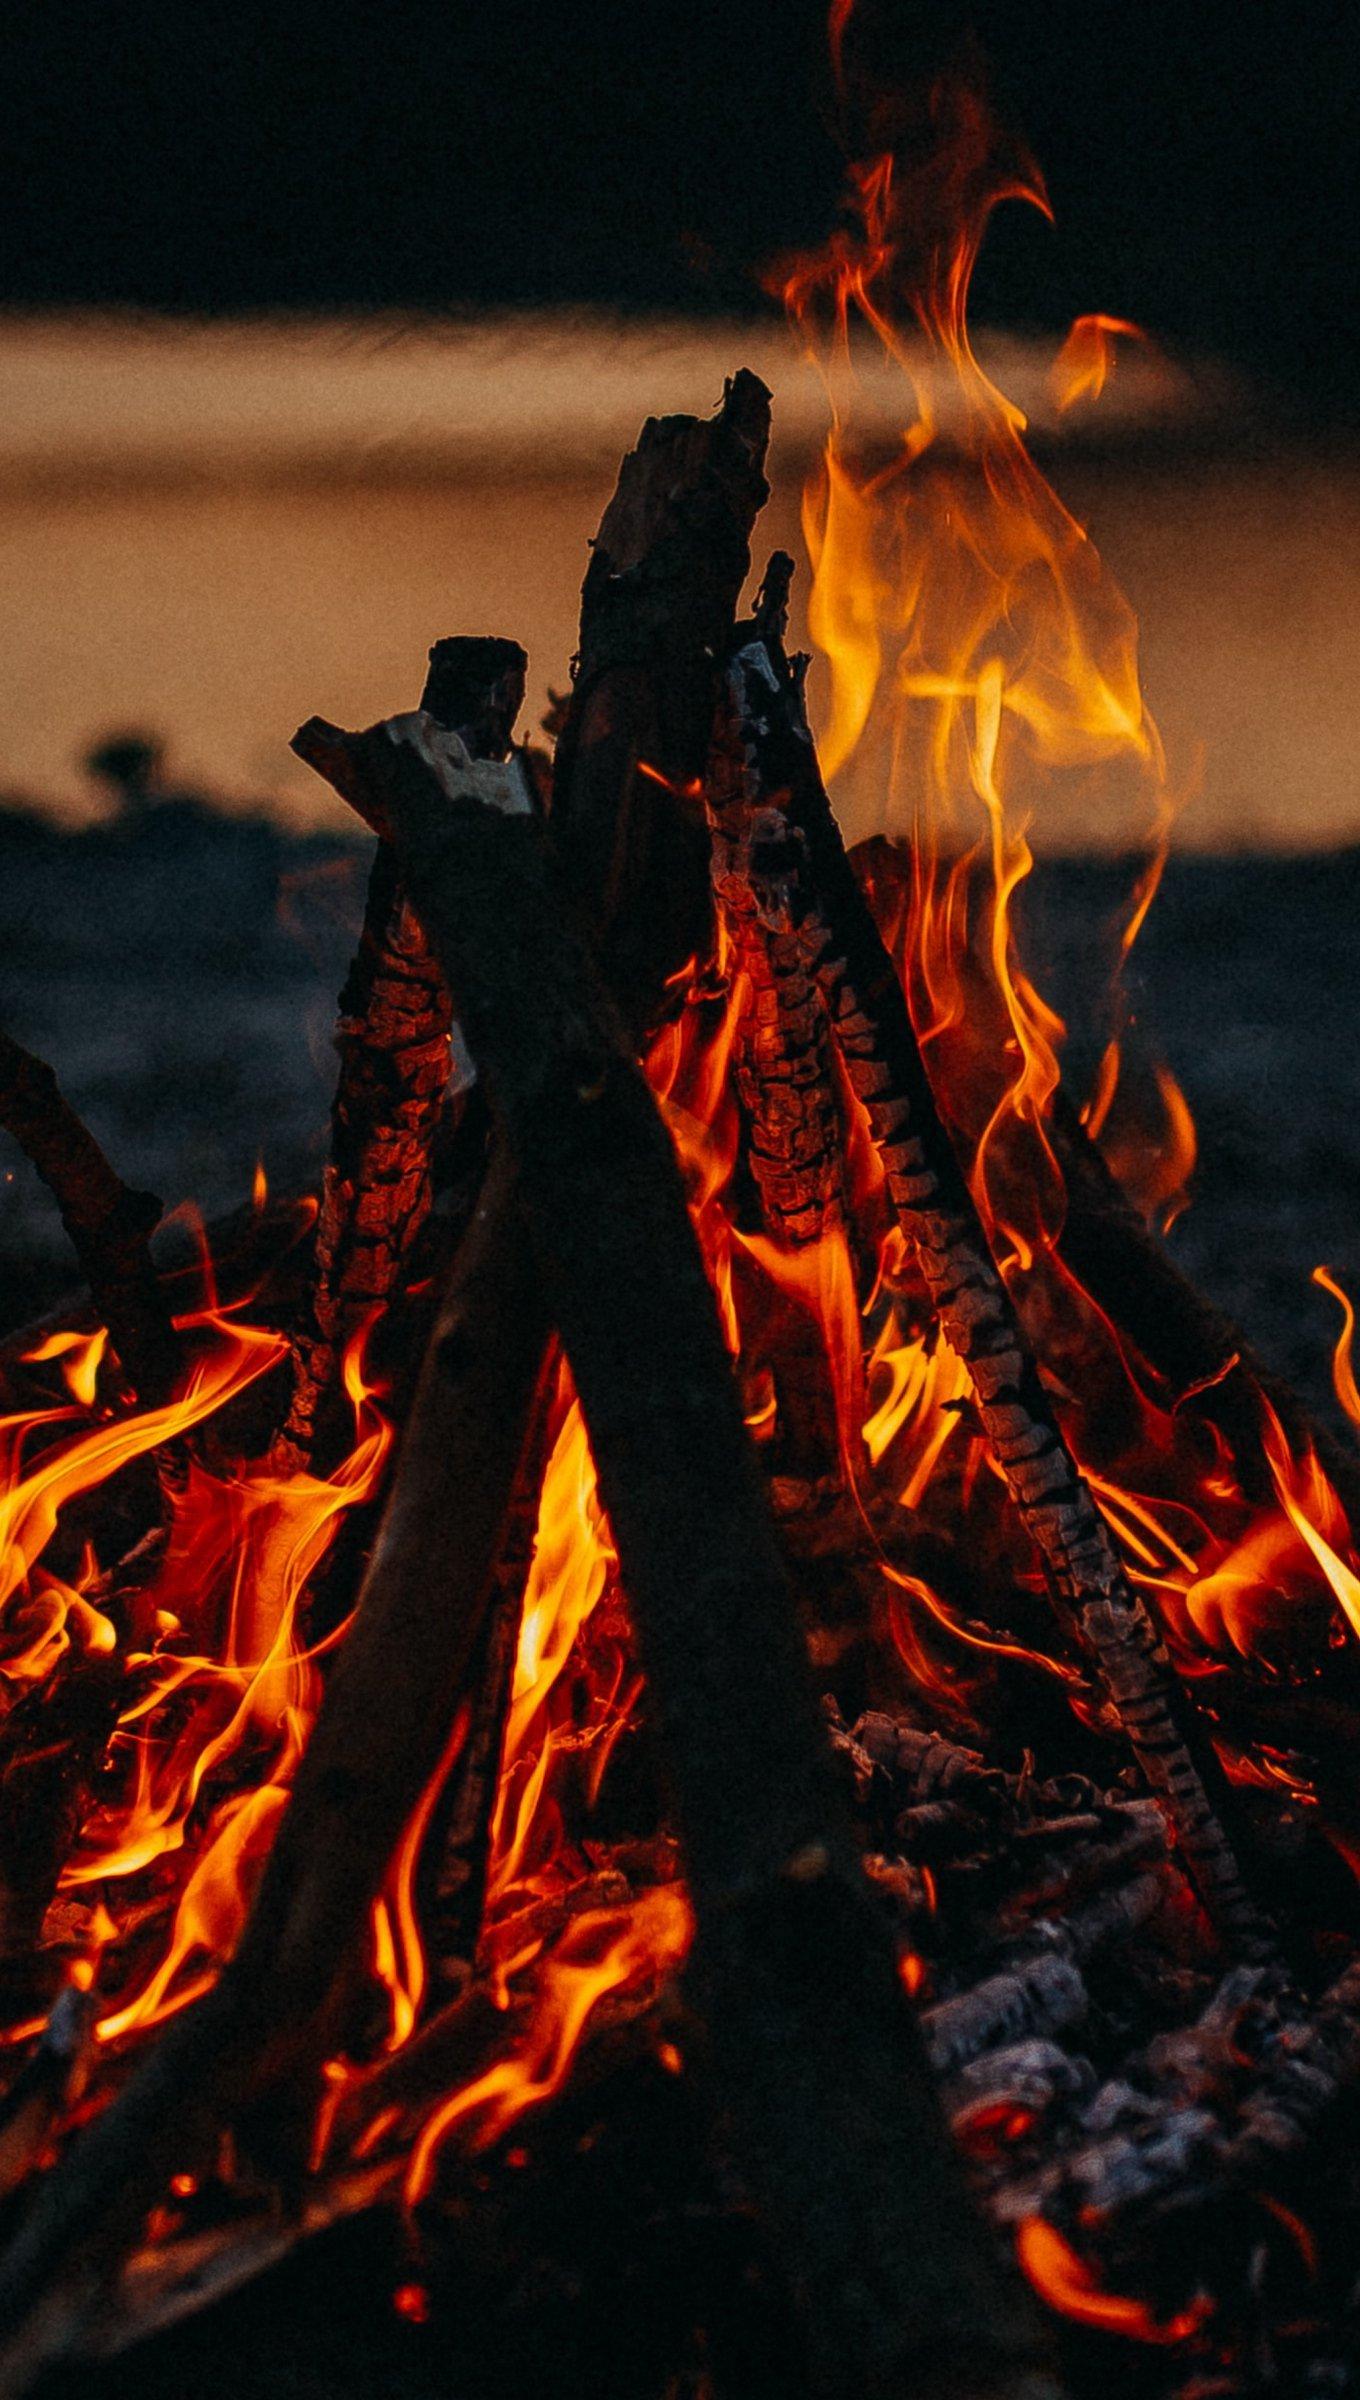 Fondos de pantalla Fuego de una fogata Vertical